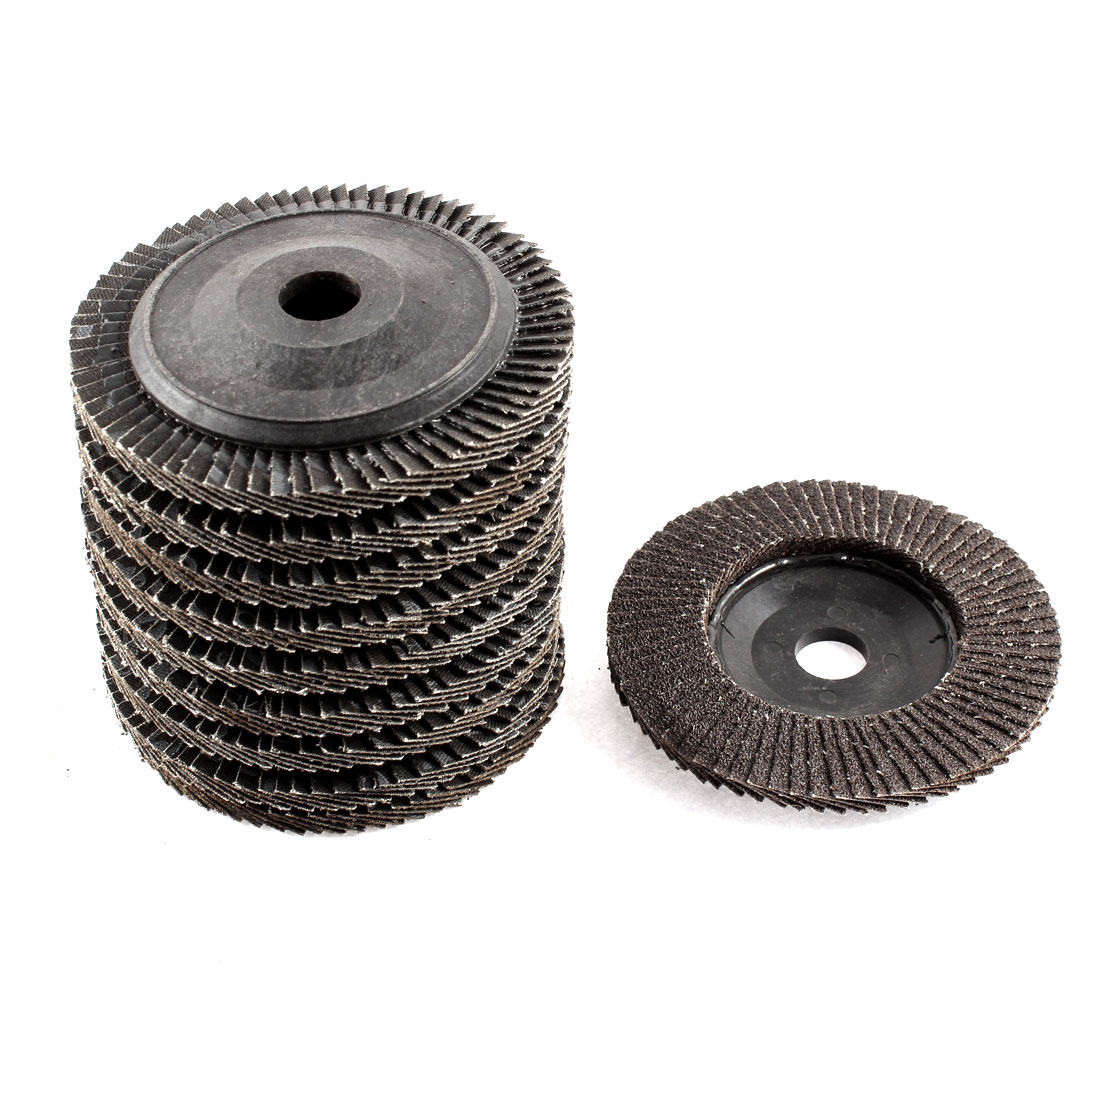 "10pcs 4"" x 5/8"" Zirconium Oxide Flap Sanding Discs Polish Grinding Wheel 60 Grit"